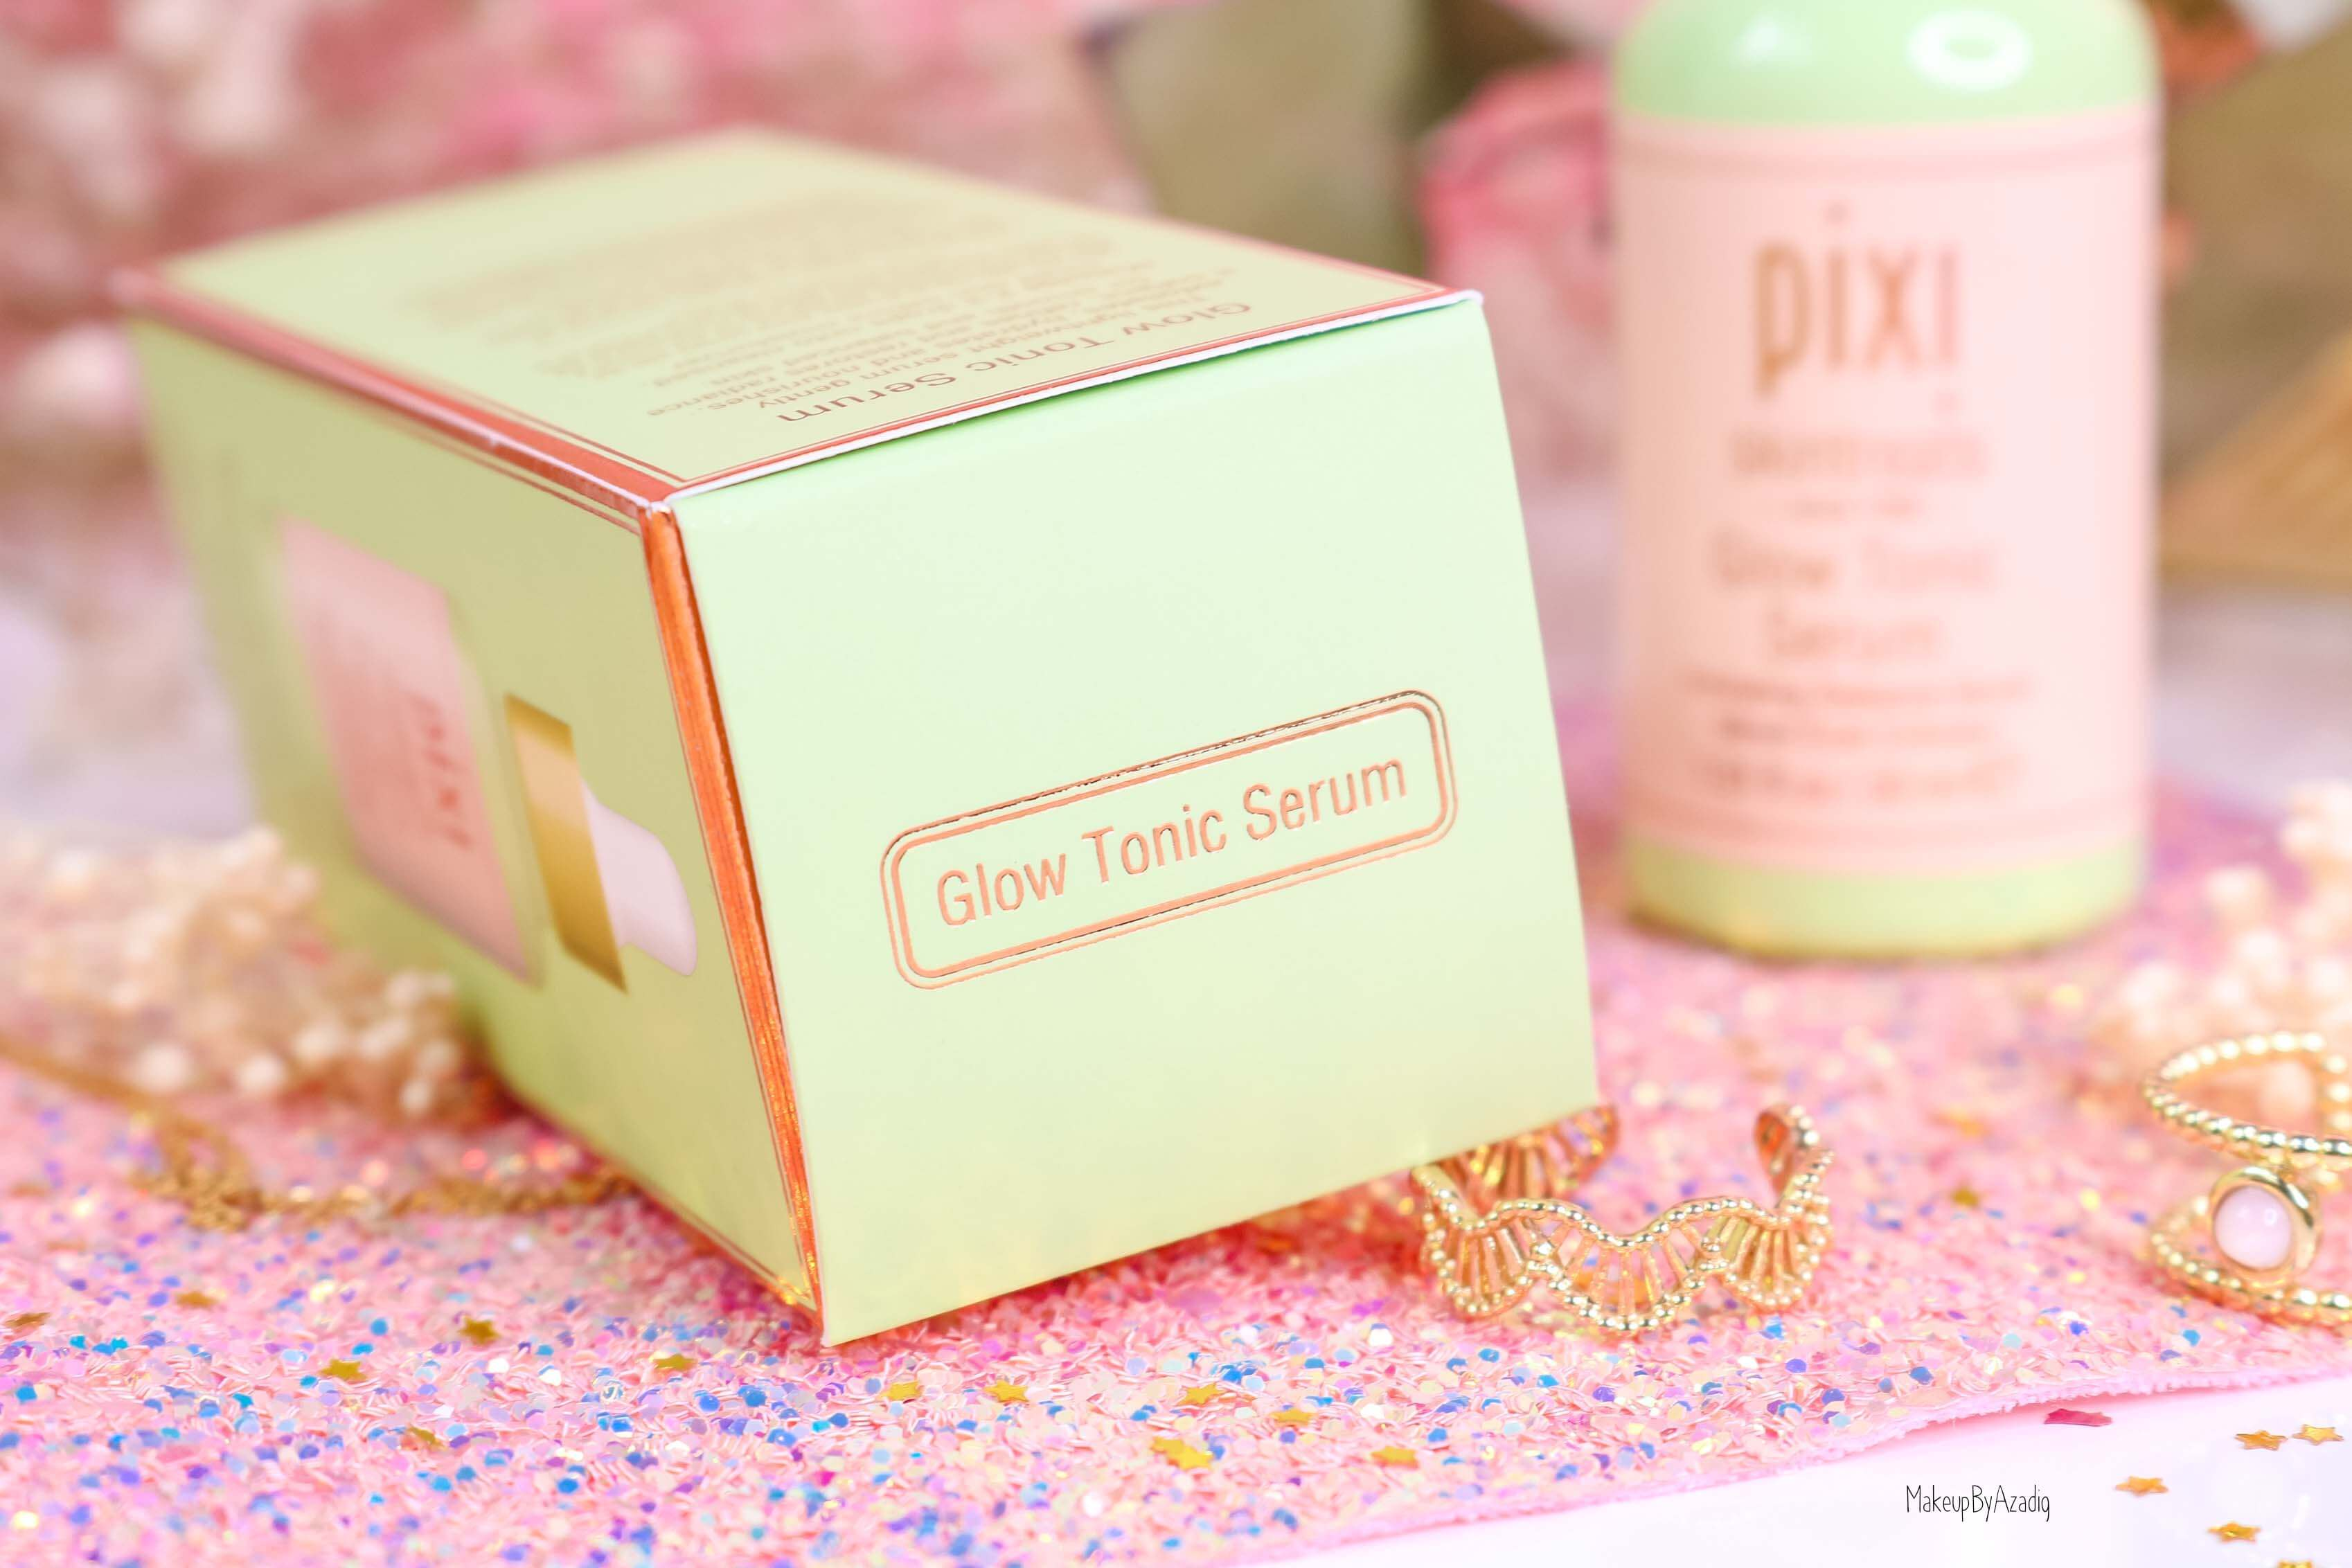 revue-routine-soin-skincare-pixi-beauty-visage-glow-tonic-serum-phenomenal-gel-aloe-vera-makeupbyazadig-sephora-avis-prix-green